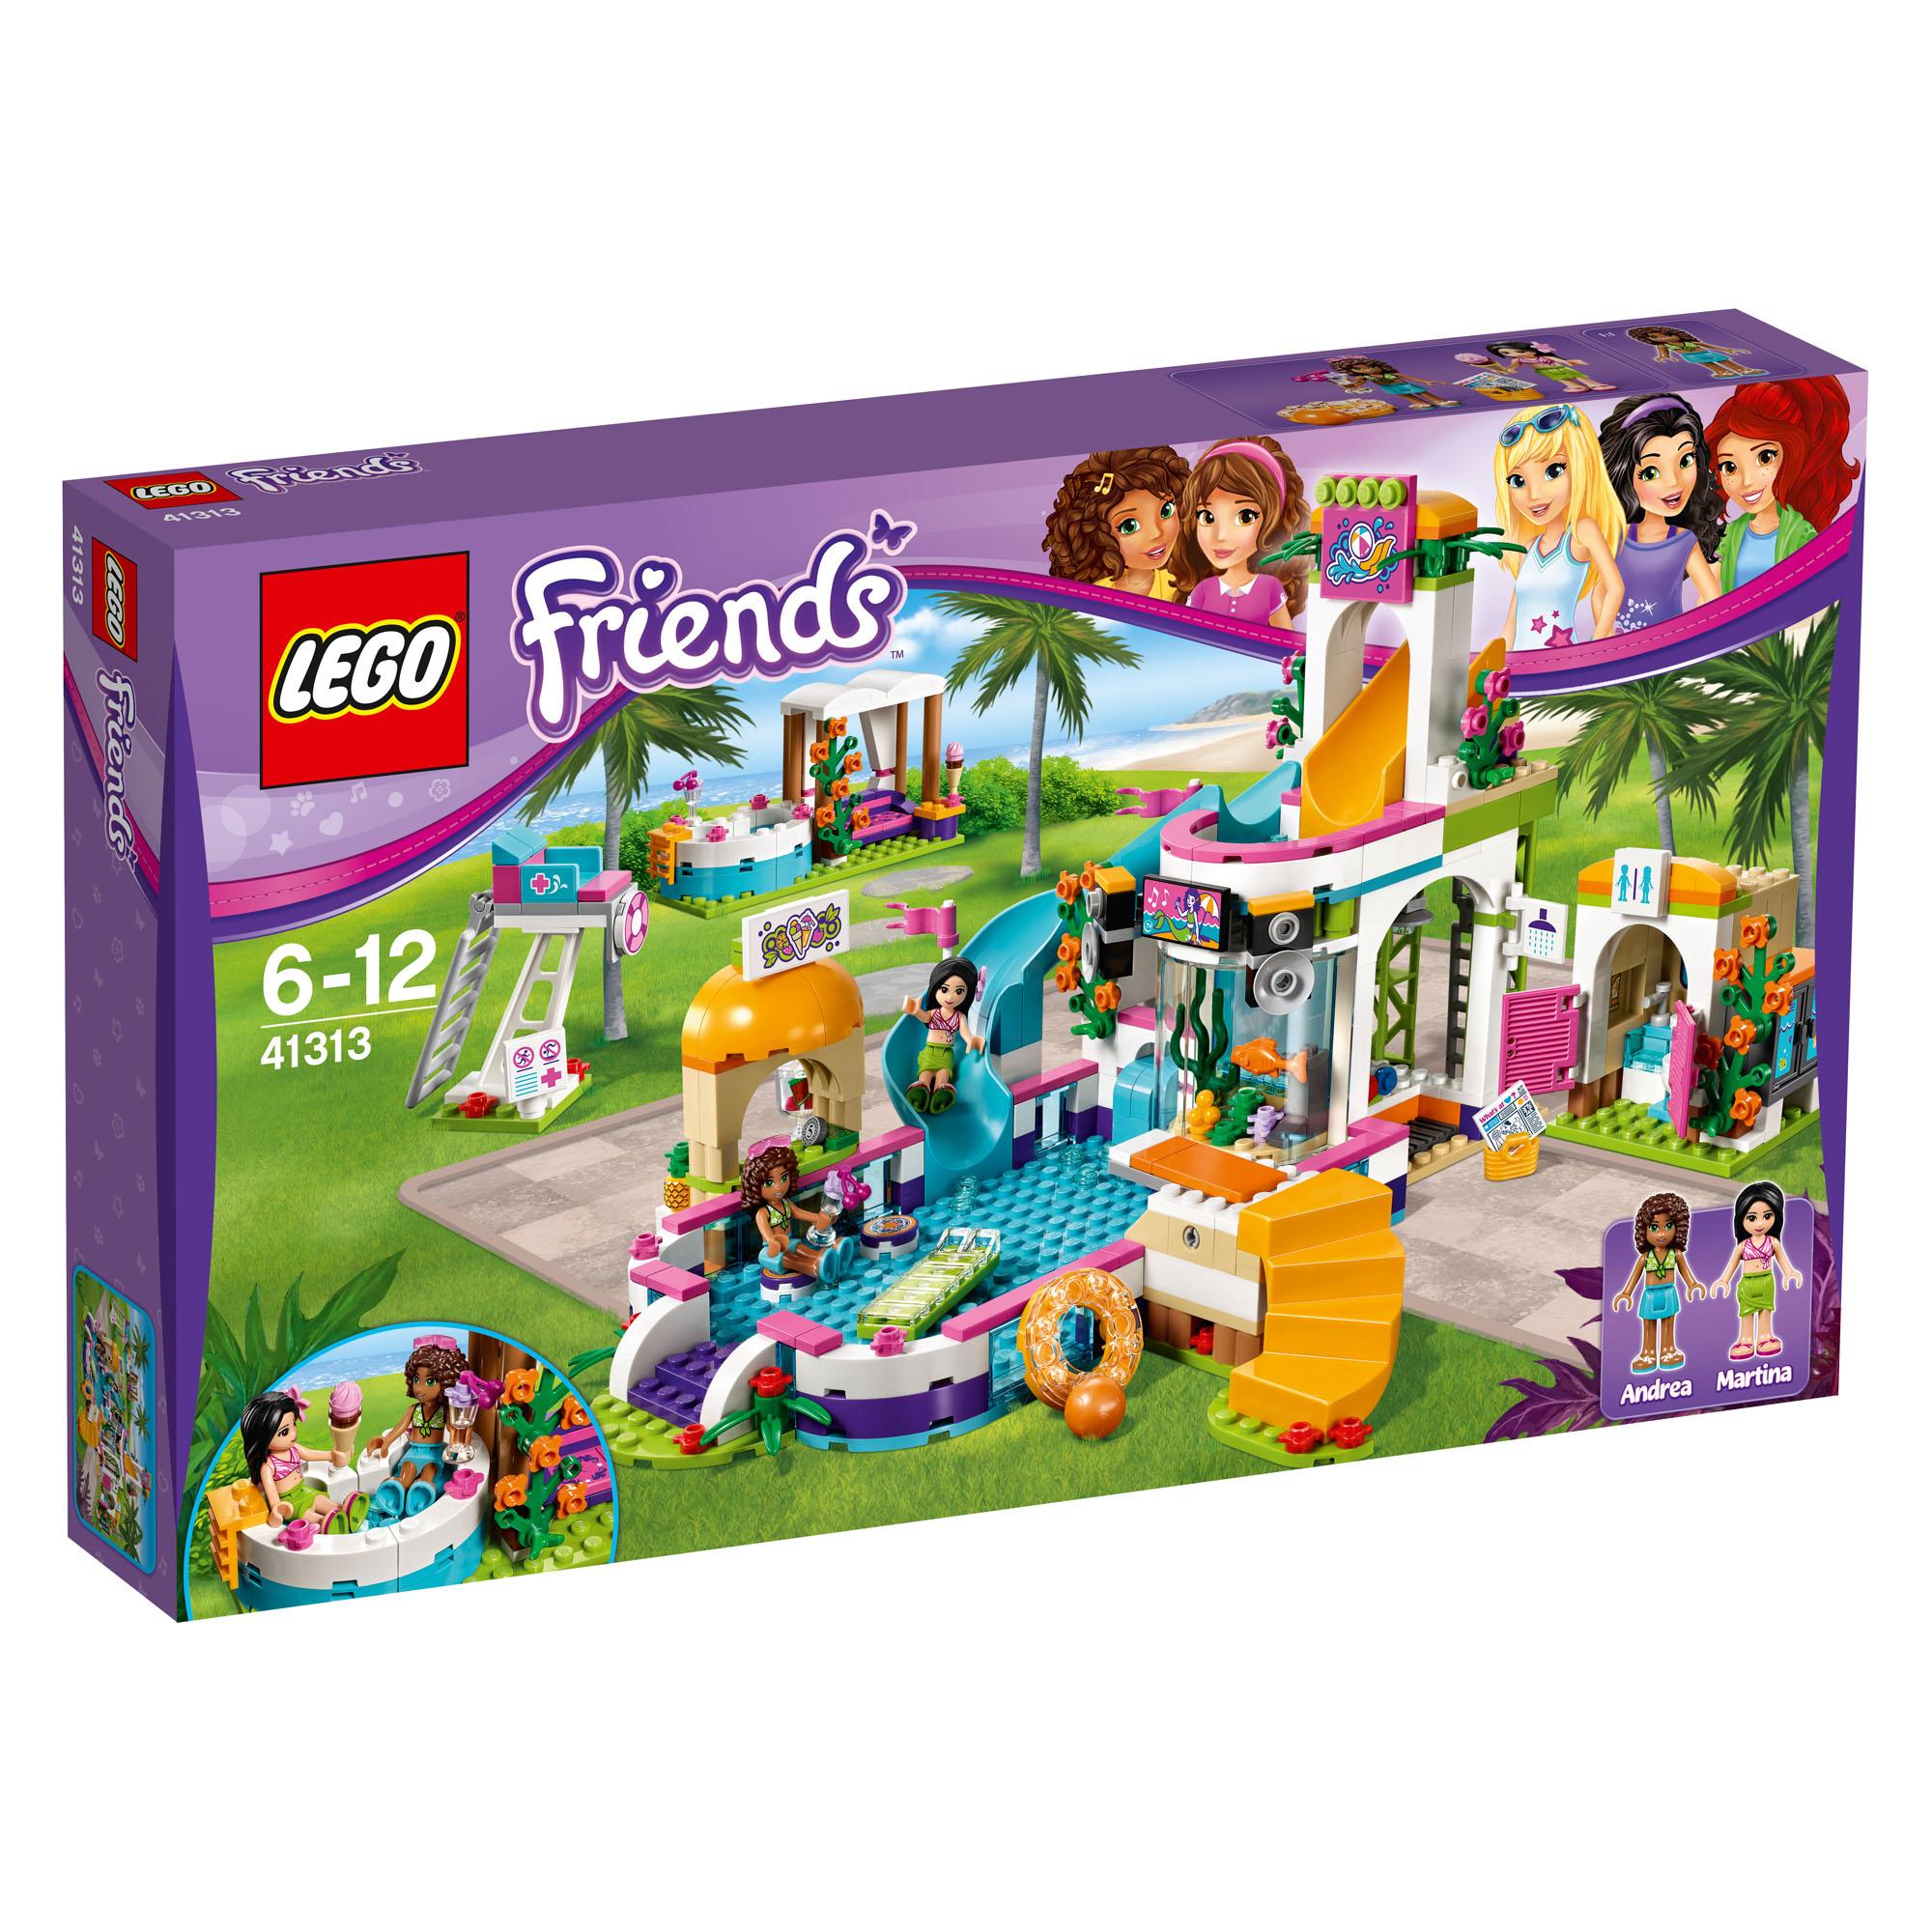 41313 Lego Friends Heartlake Summer Pool Andrea Martina 589 Pcs 6